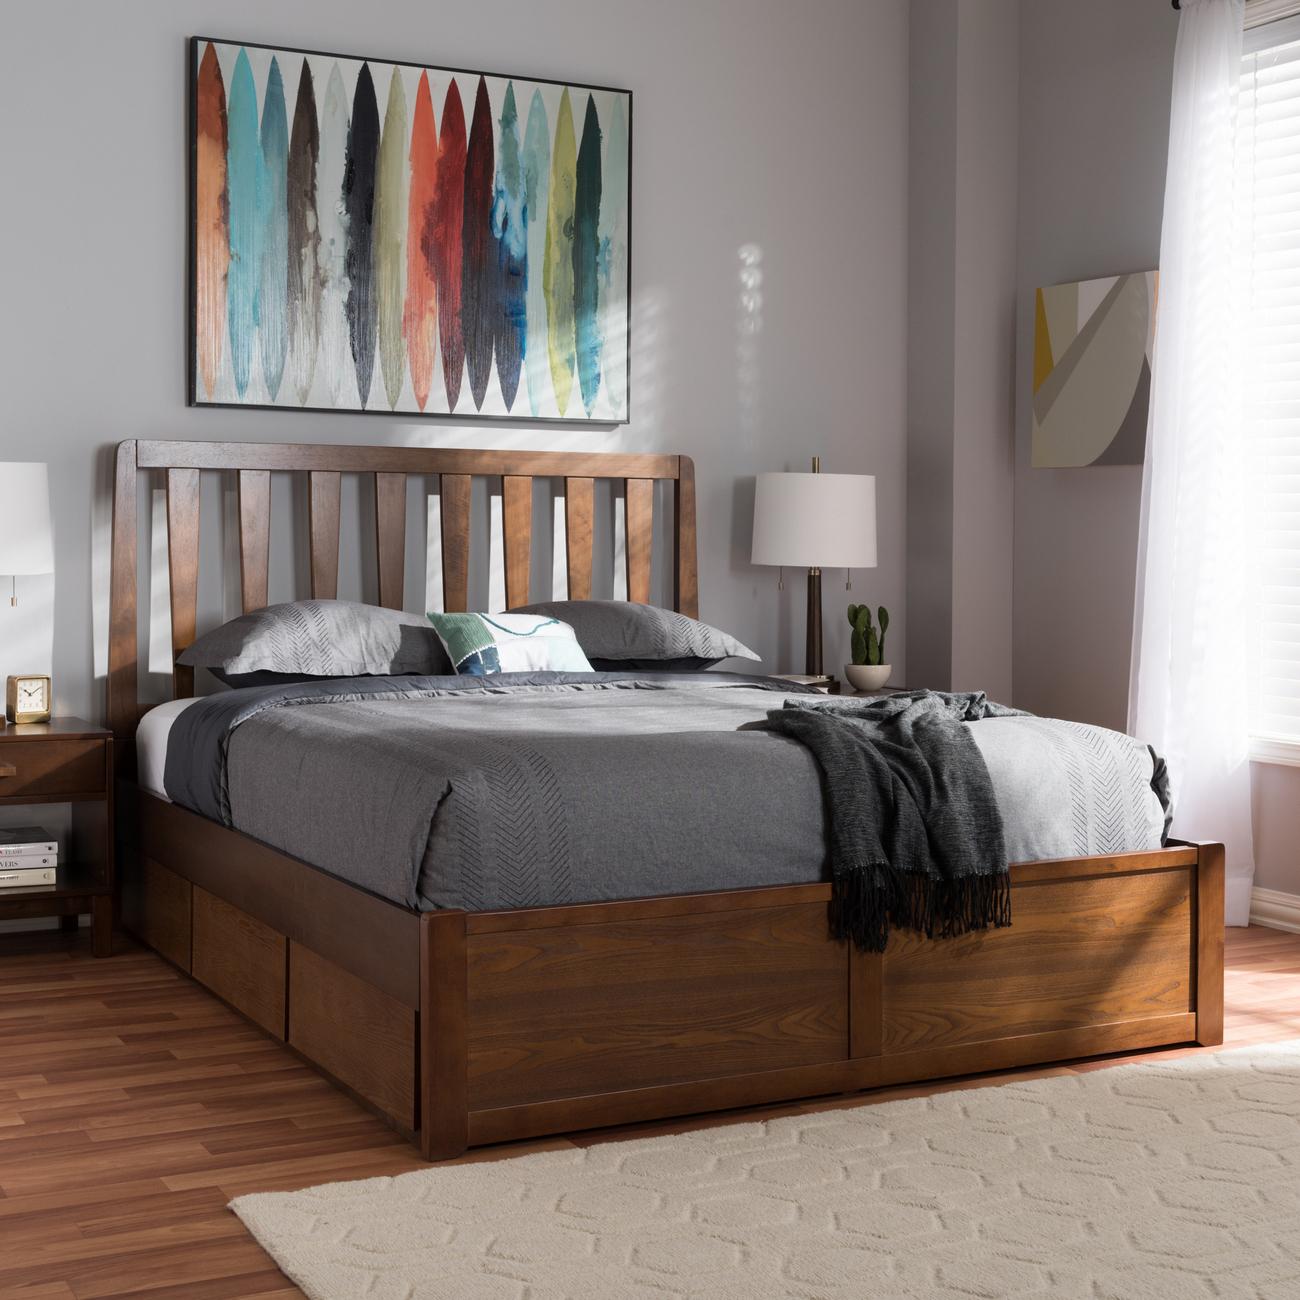 Wholesale Interiors Raurey Modern Contemporary Walnut Finished King Size